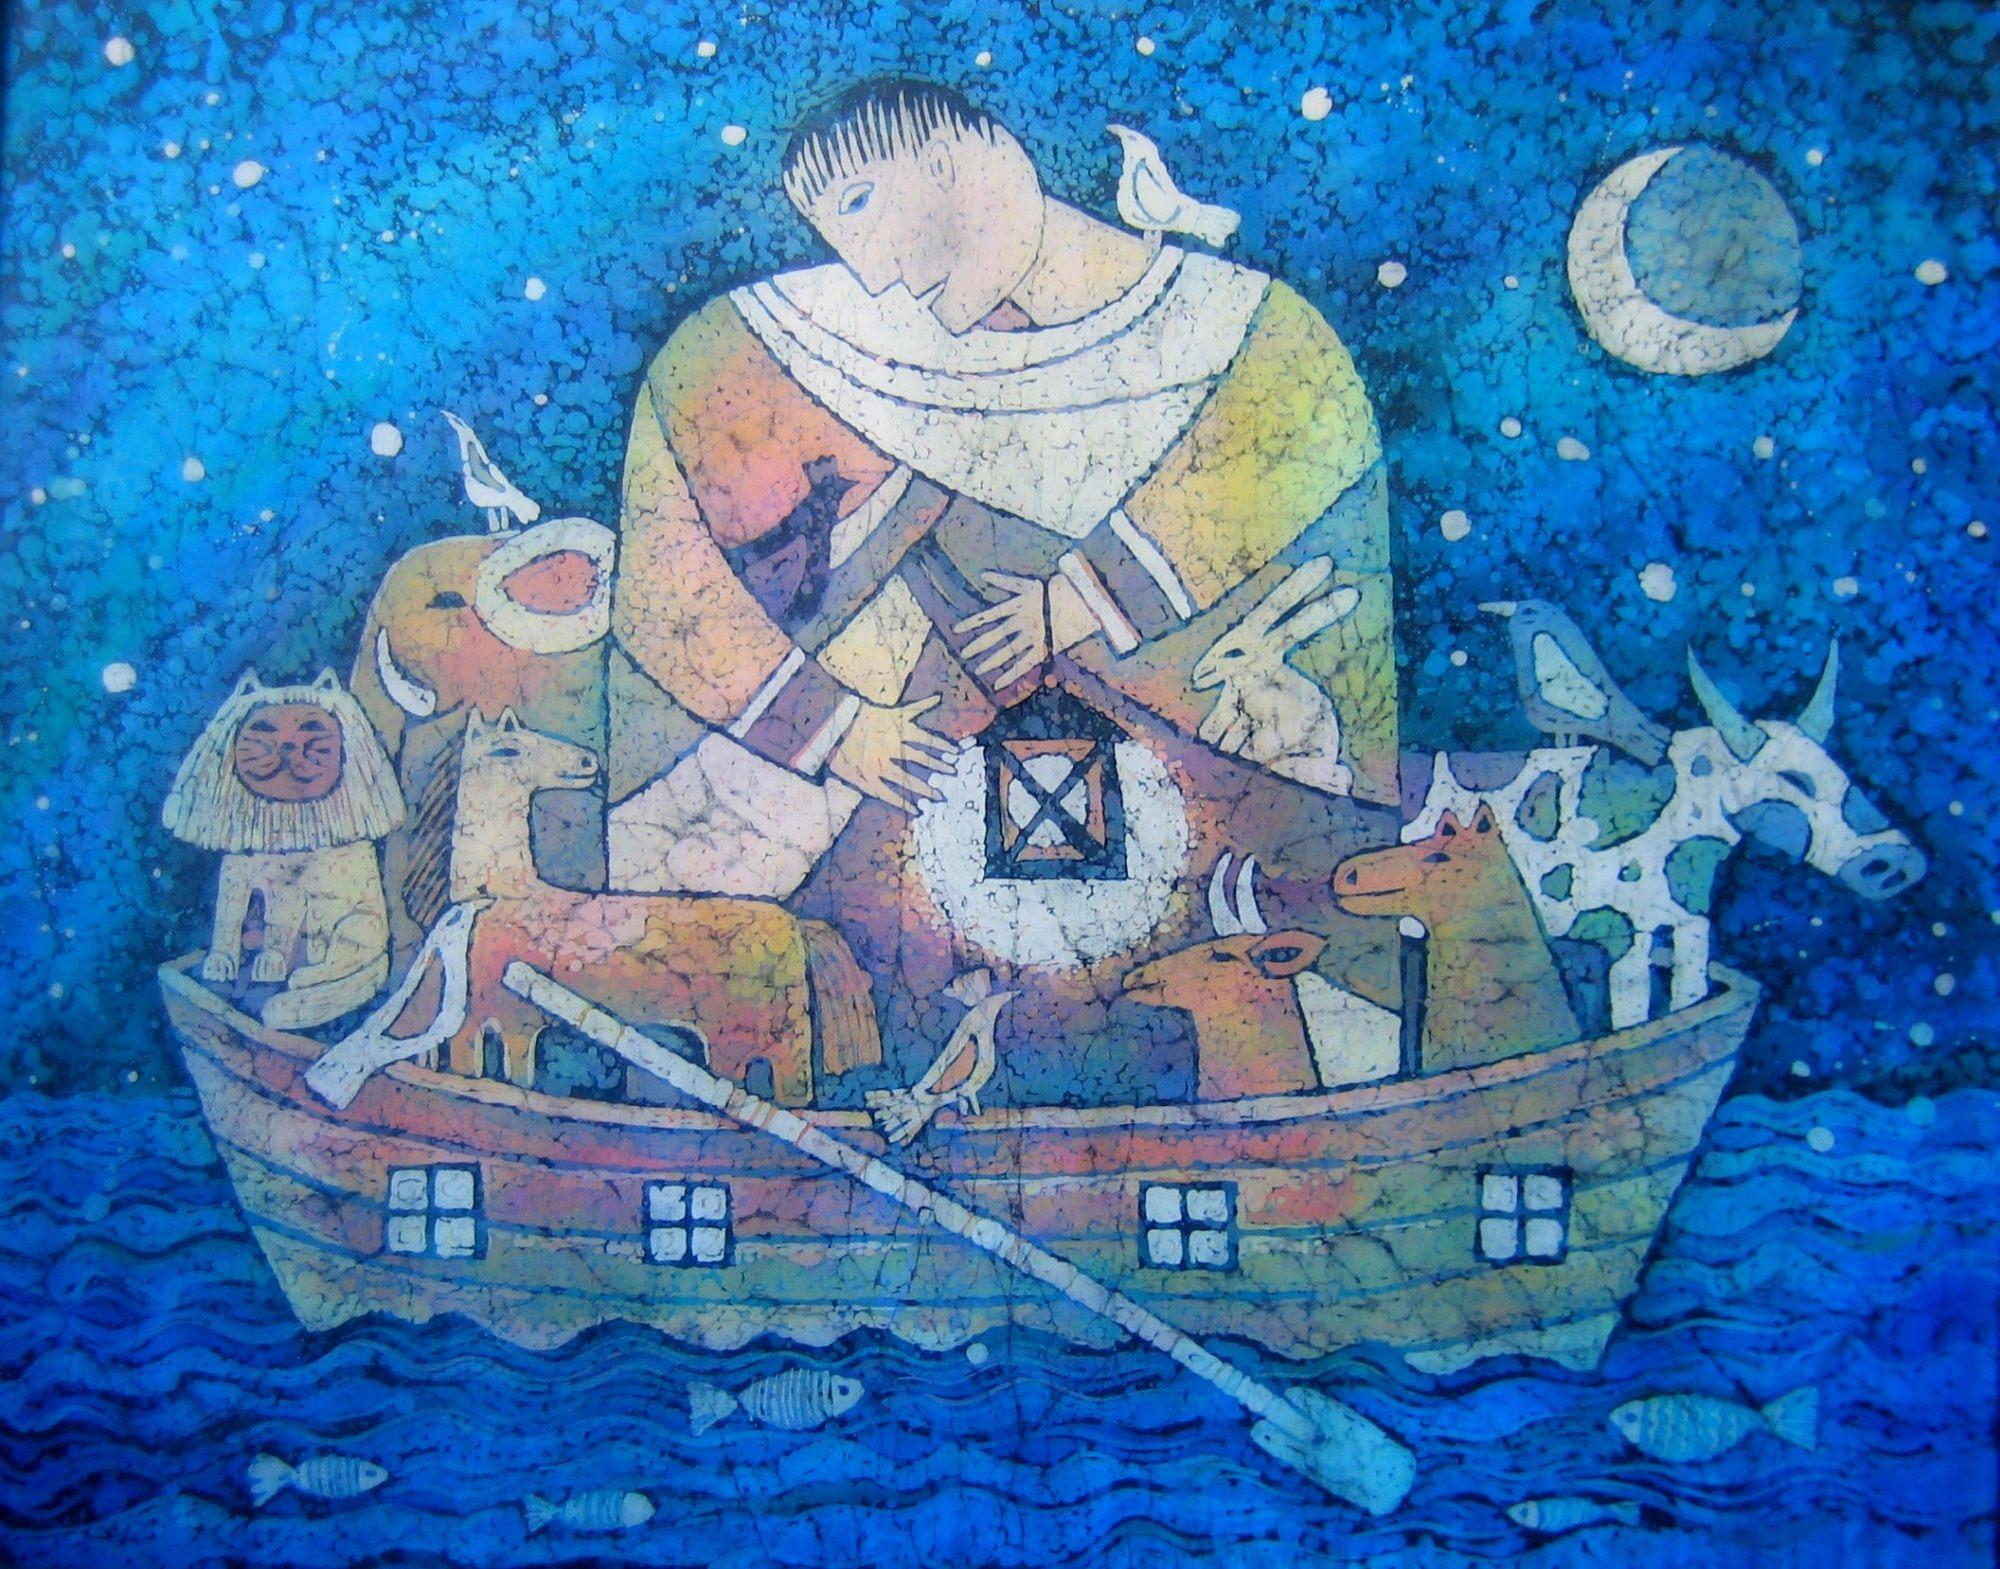 batik - Noahs-ark.-hot-batik.-60х80.-2009